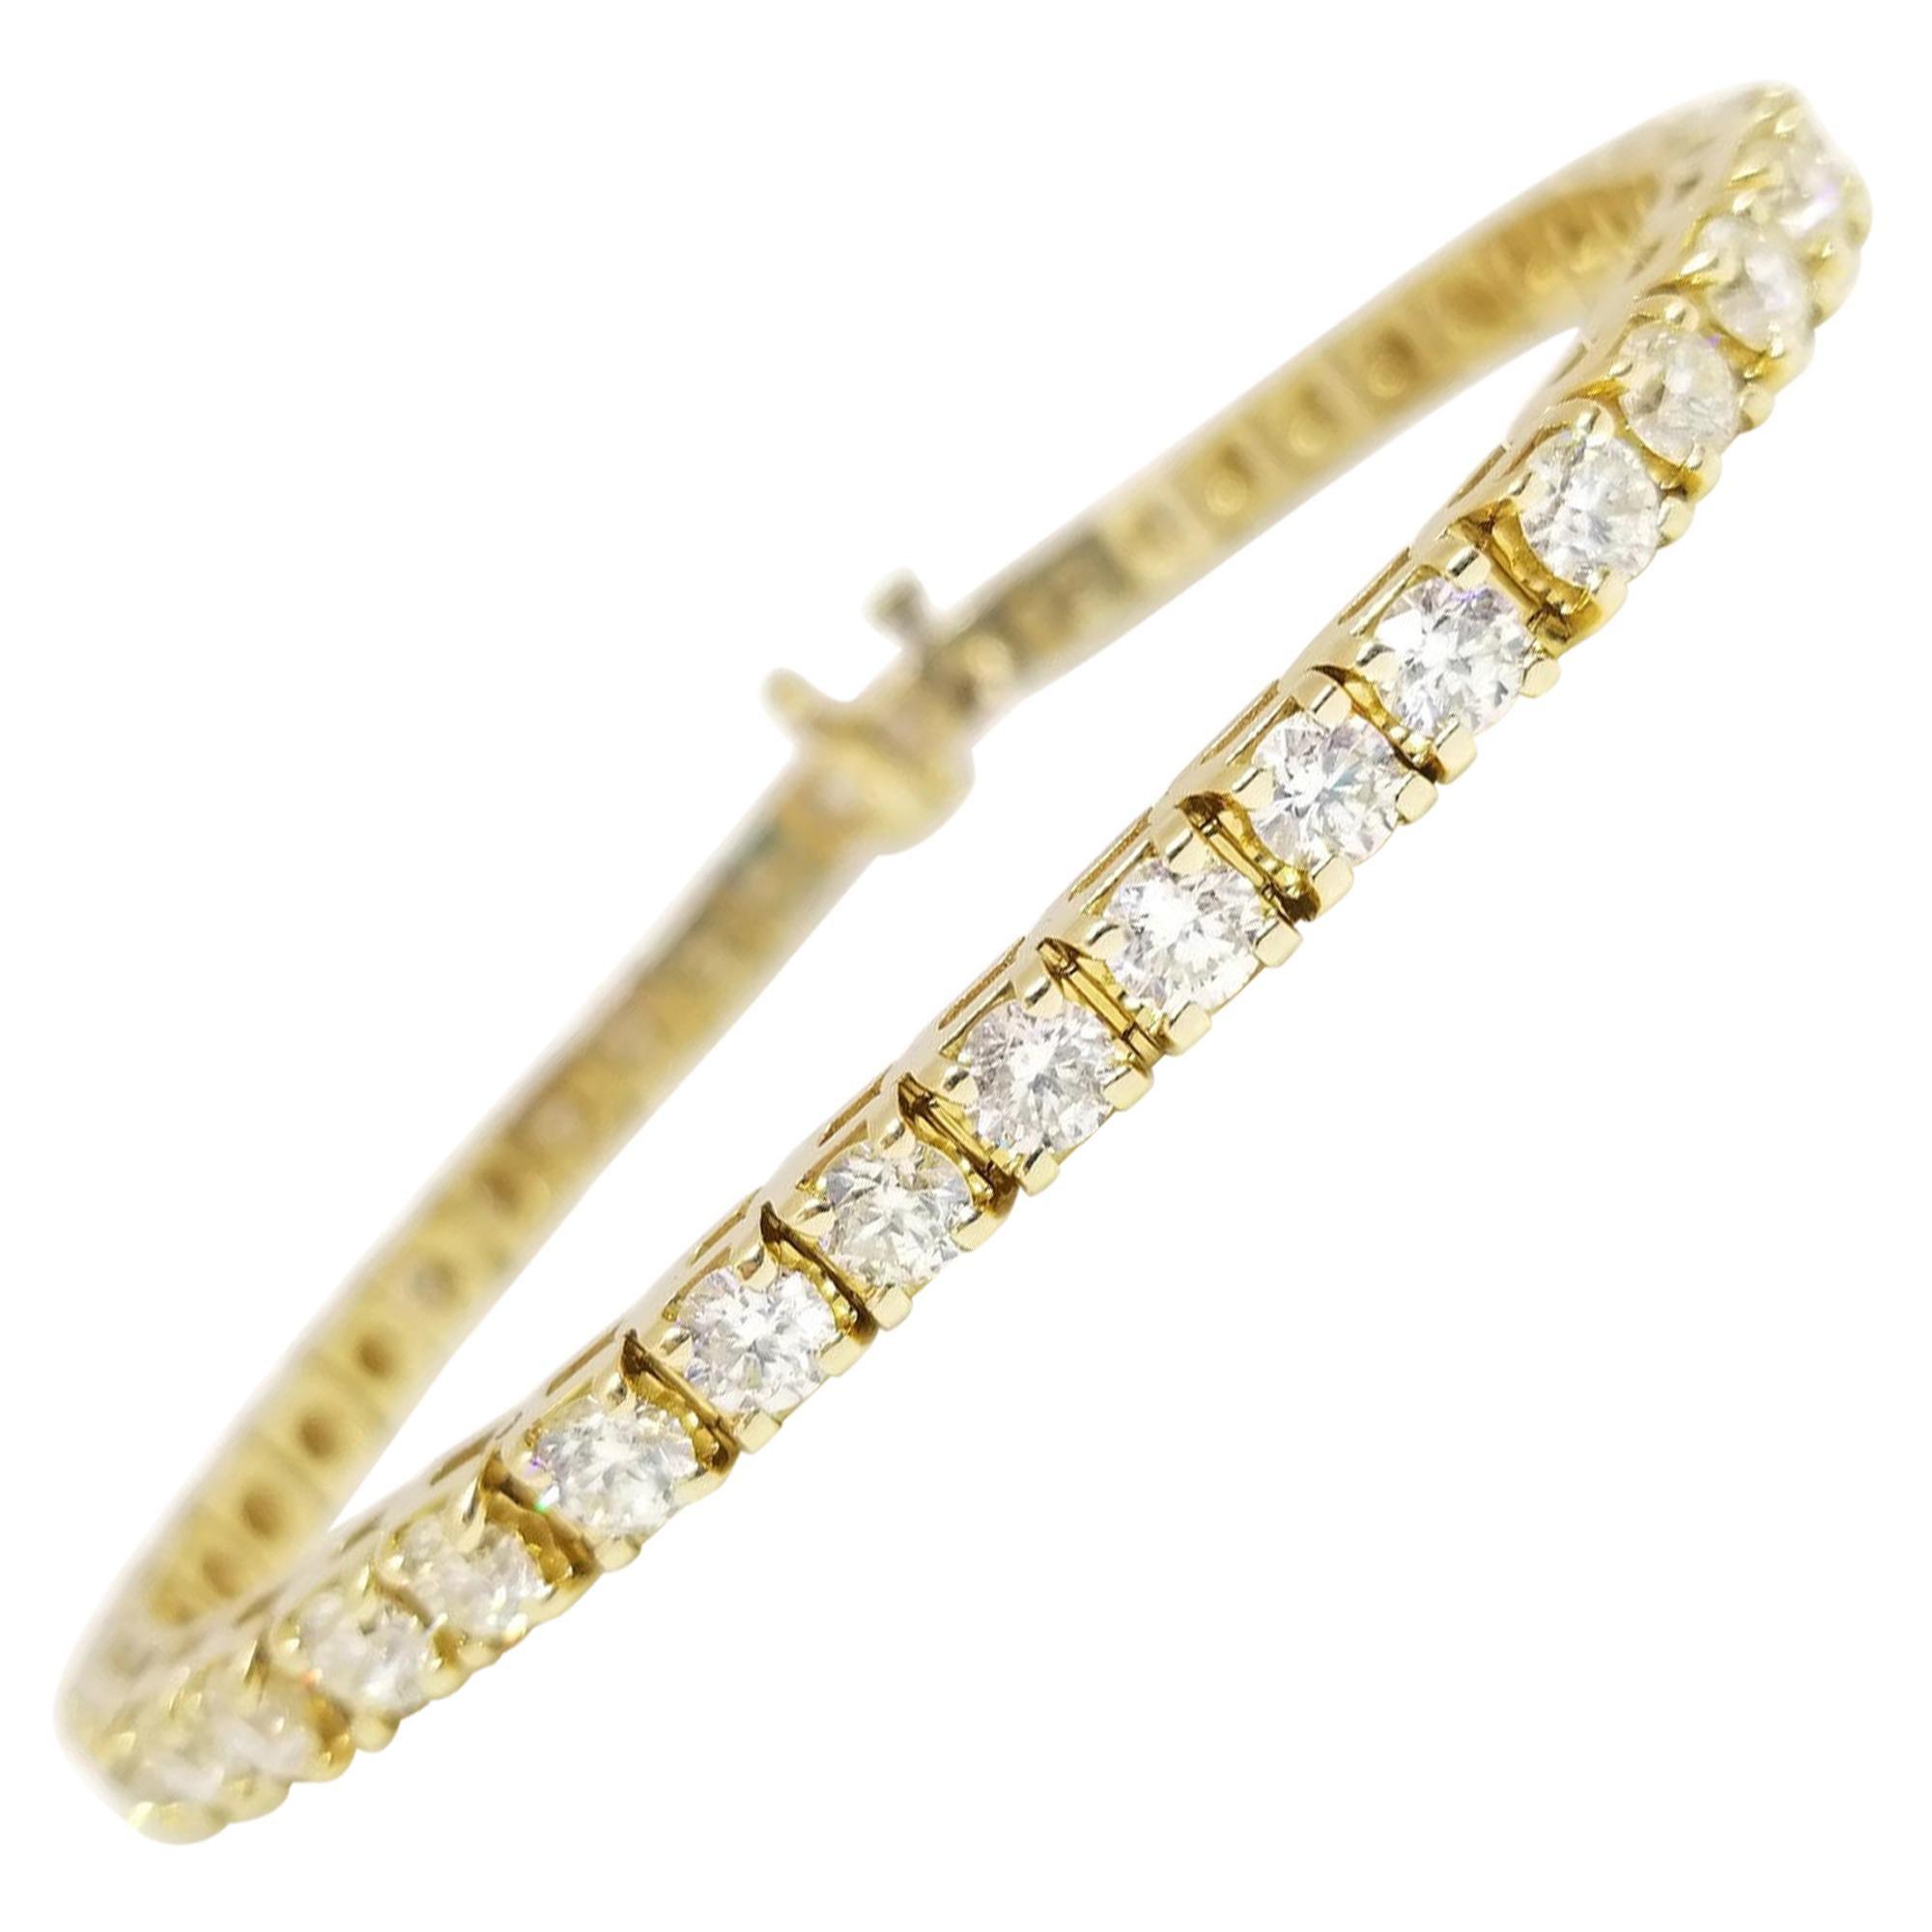 7.86 Carat Round Brilliant Cut Diamond Tennis Bracelet 14 Karat Yellow Gold